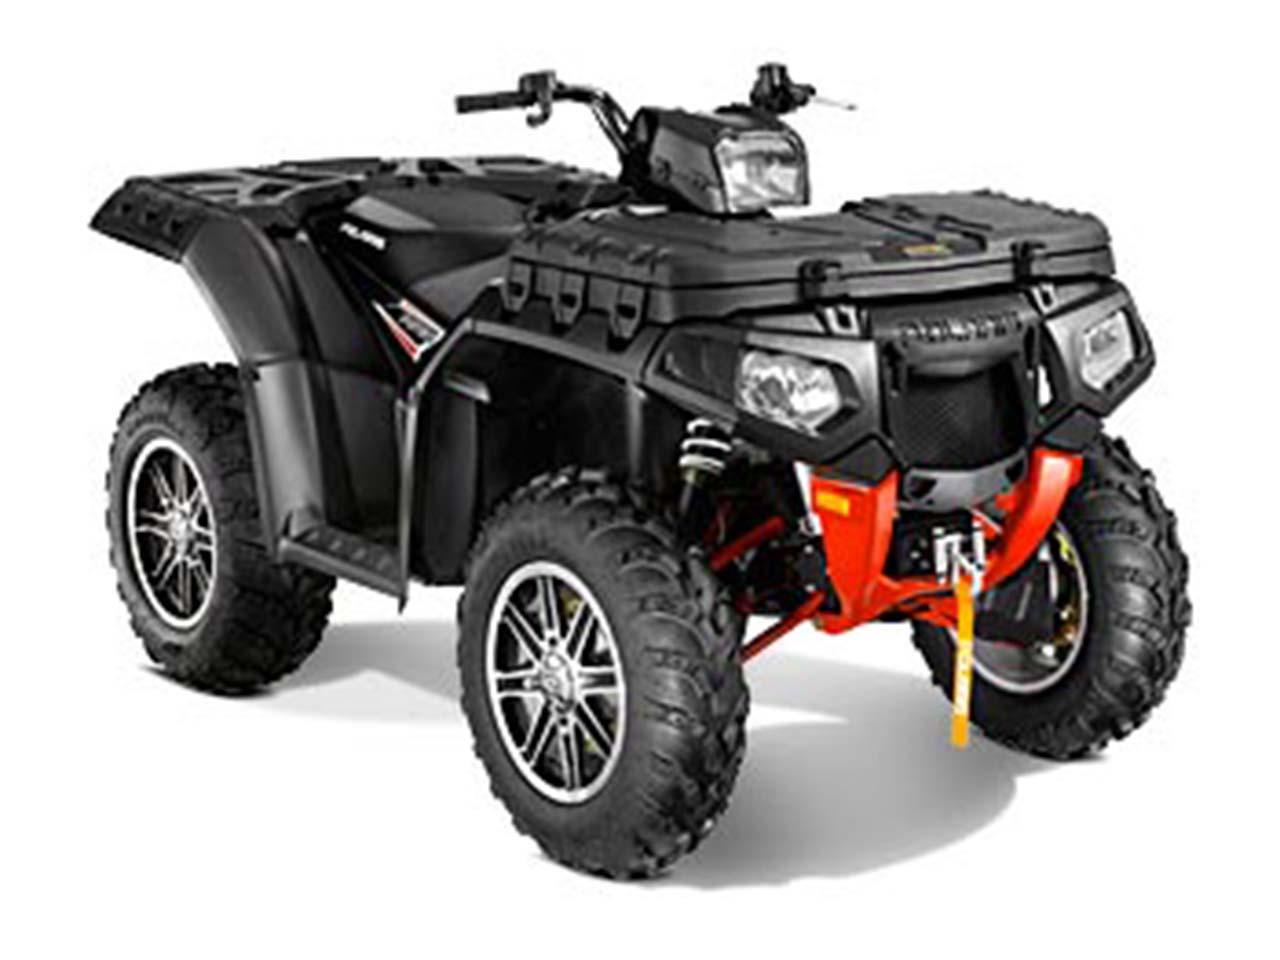 Polaris 2013 Limited Edition Models | ATV Illustrated